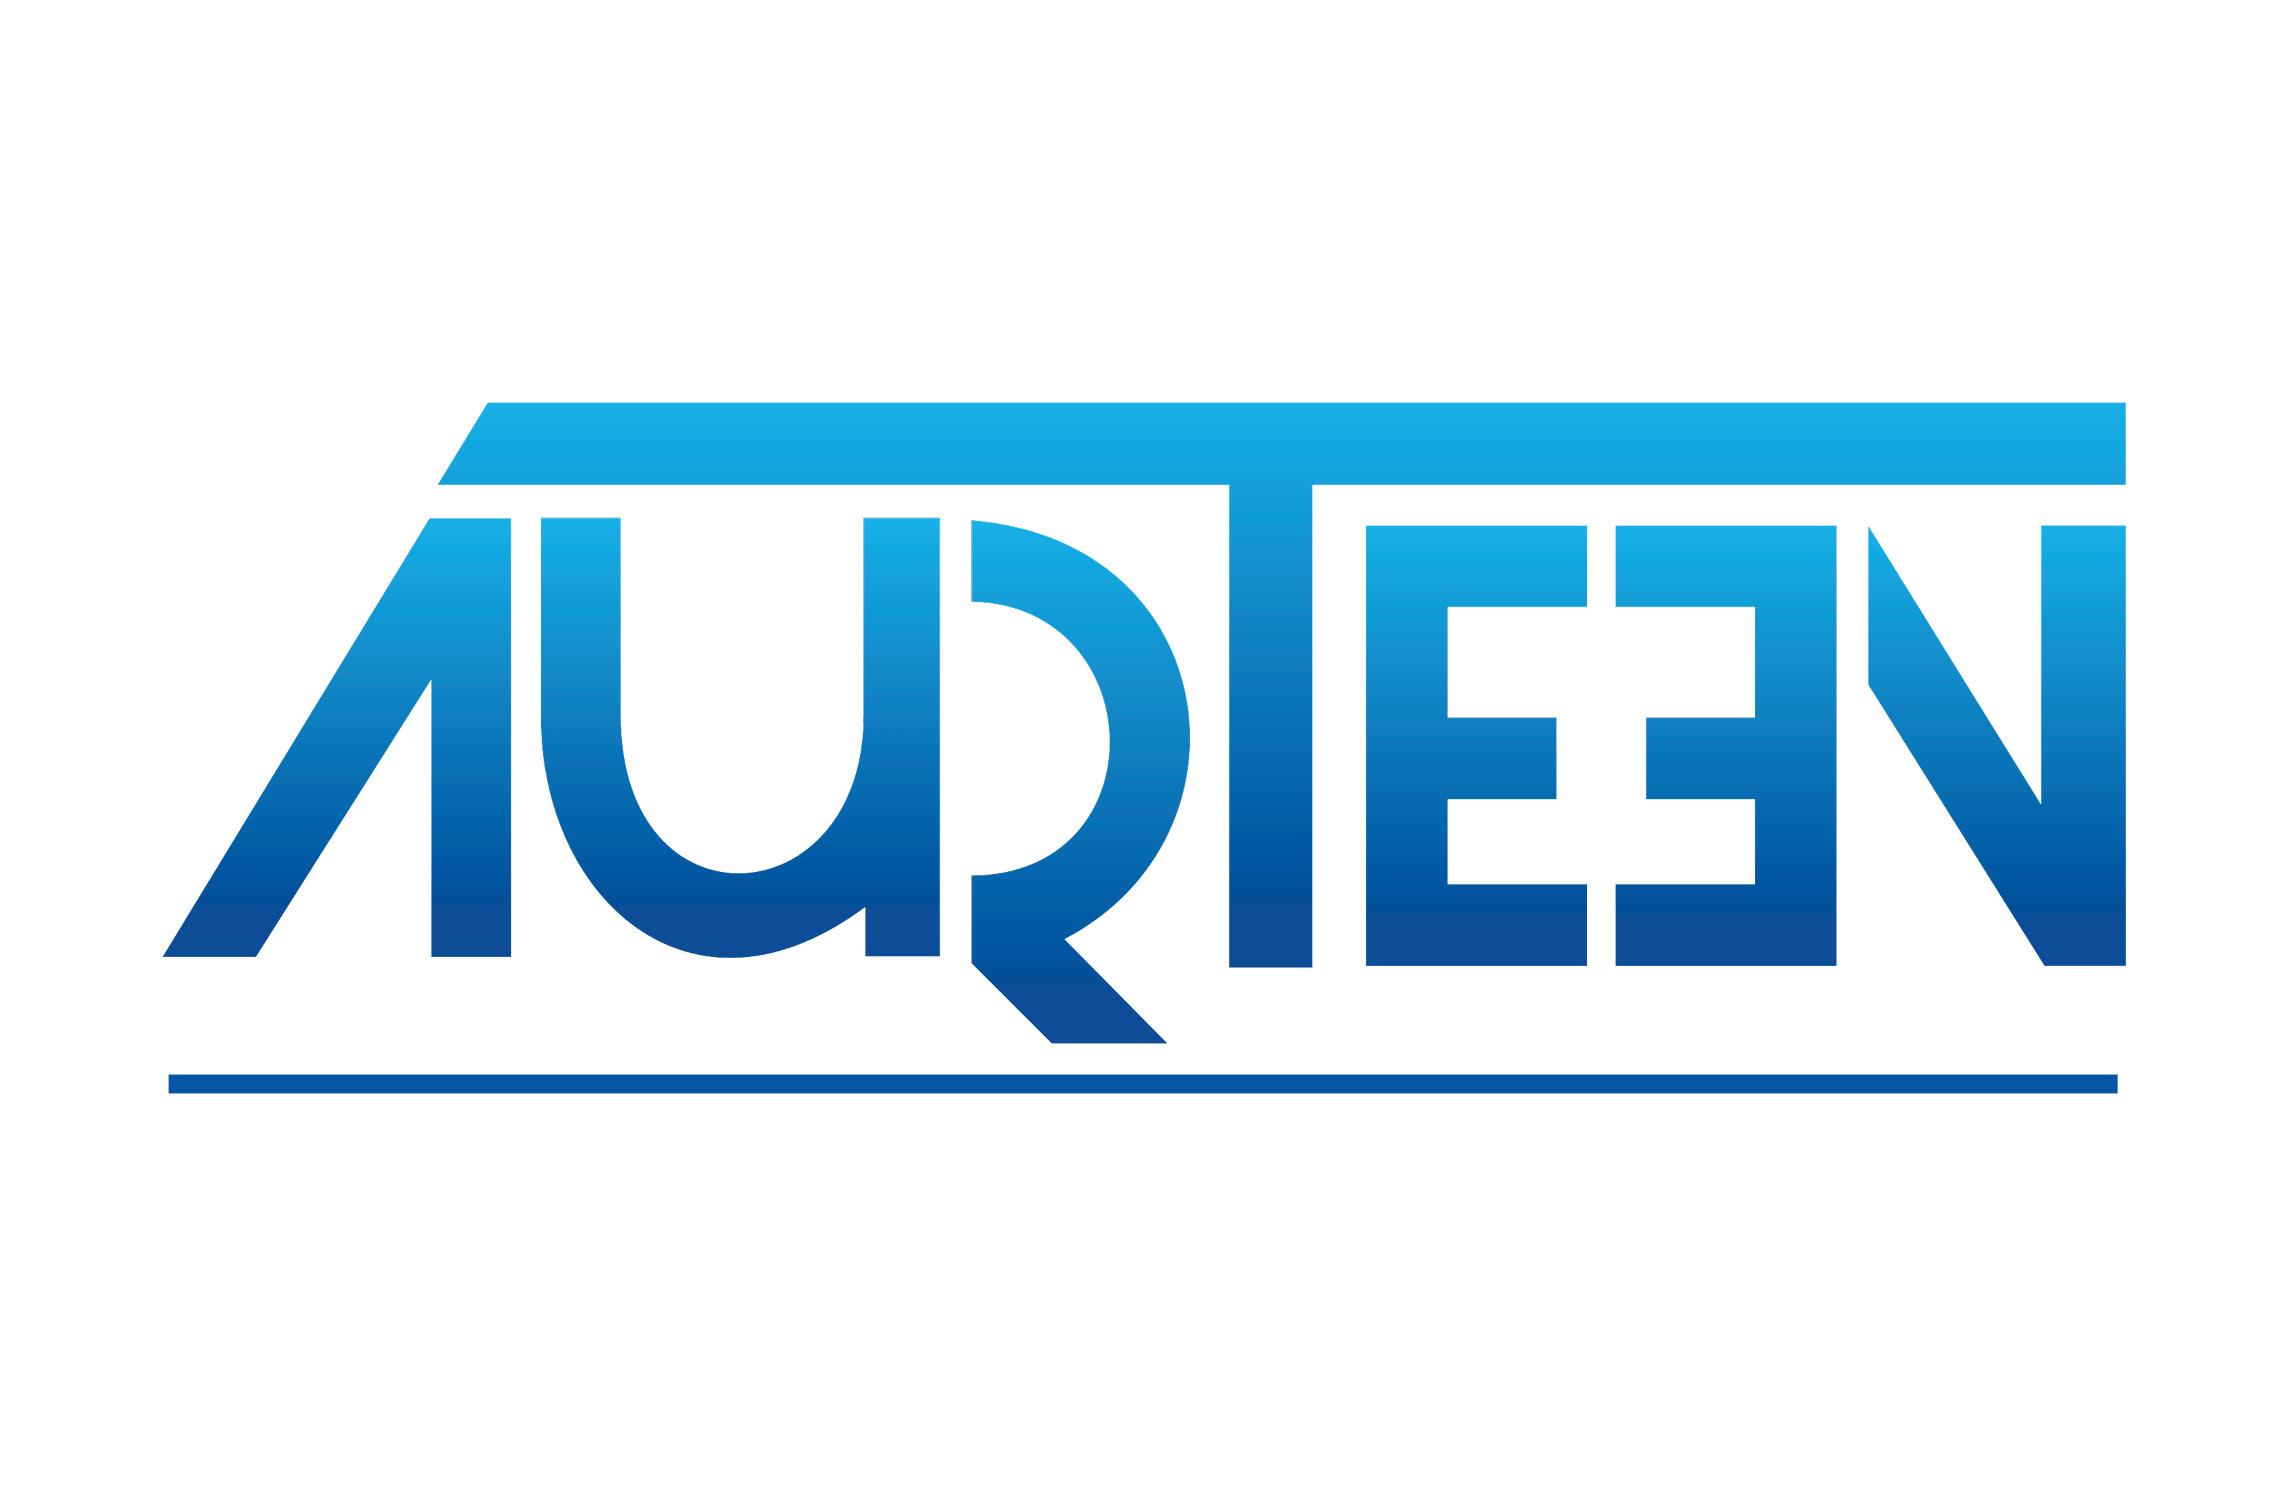 aruteen logo